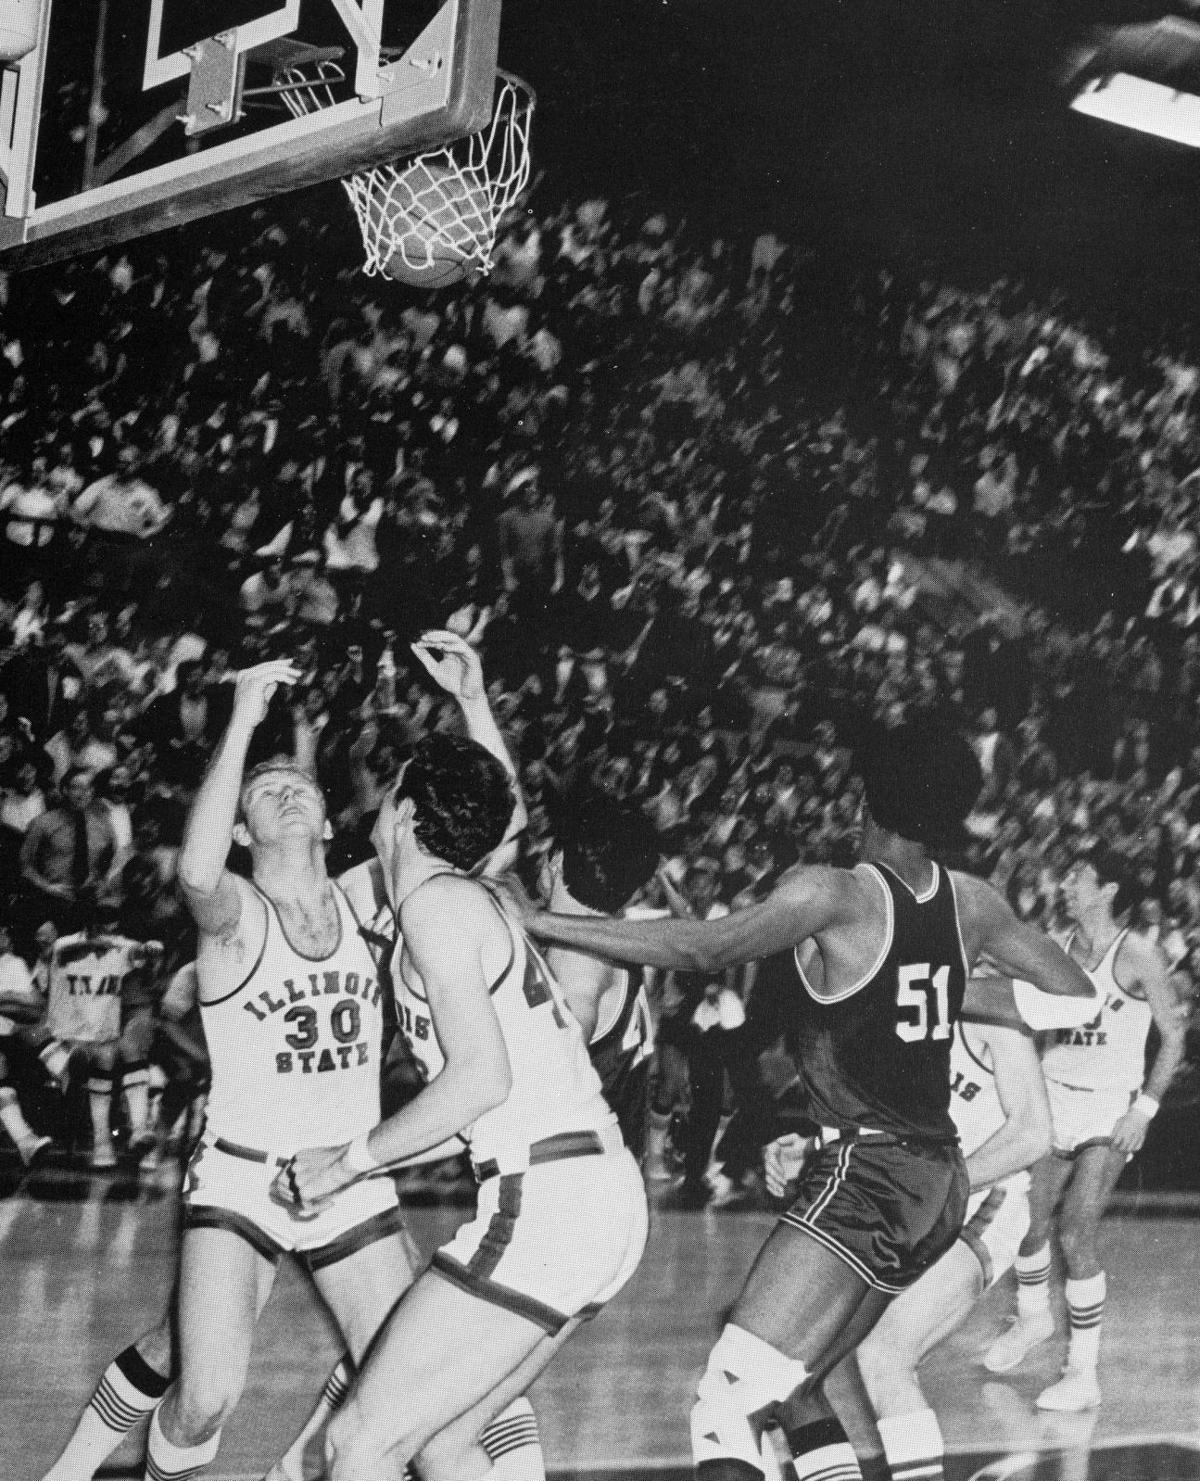 Winning shot from last ISU-IWU basketball game in 1970